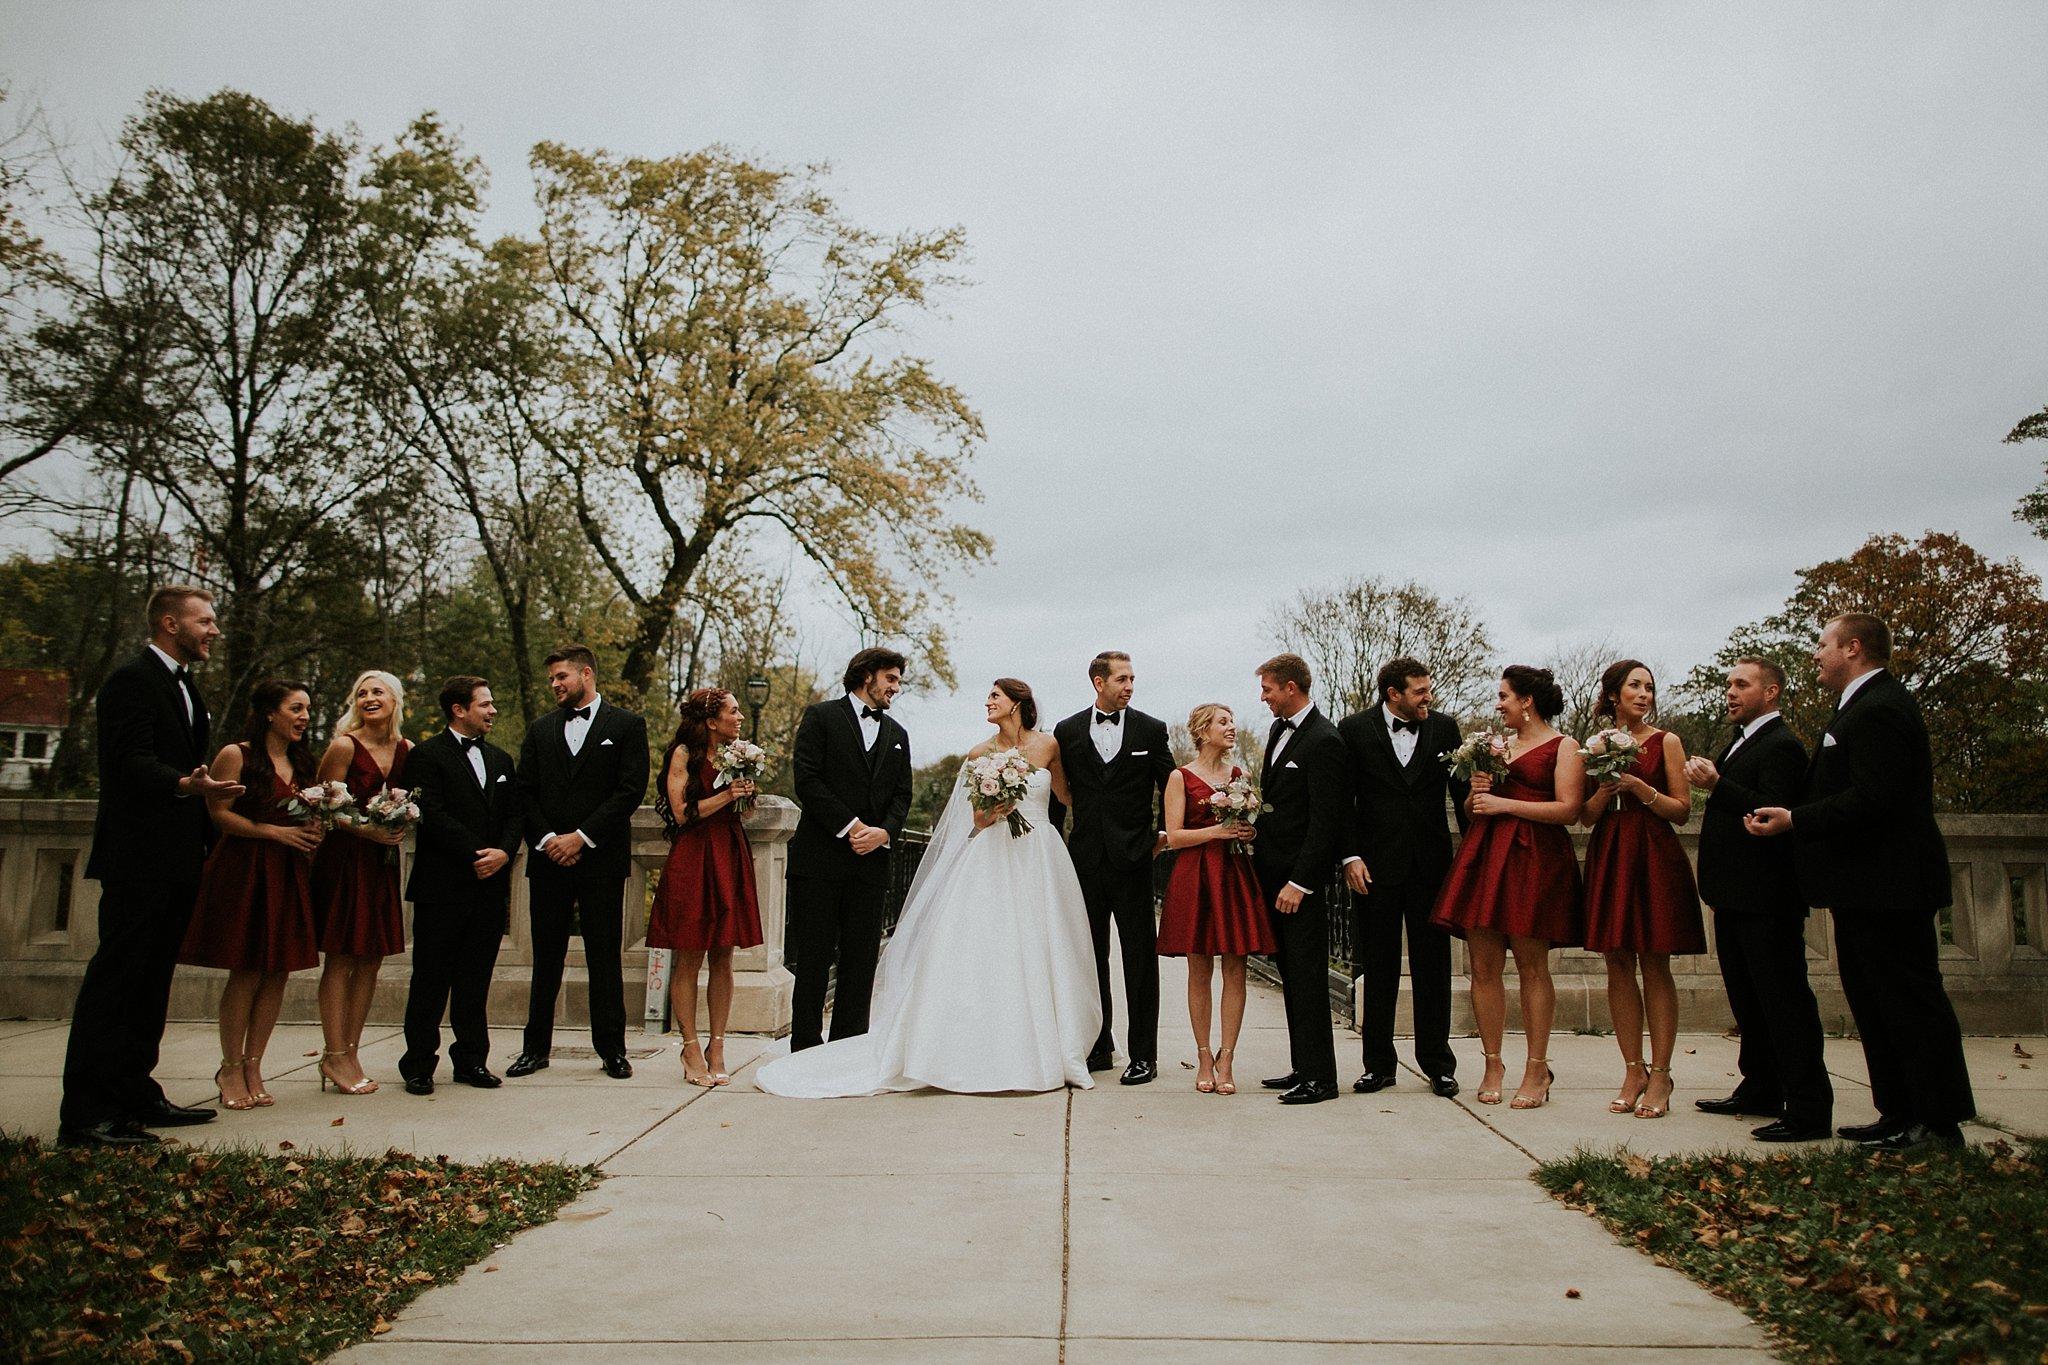 Matt-Lauren_St-Marys_Hilton-City-Center-Milwaukee-Wedding_liller-photo_0035.jpg